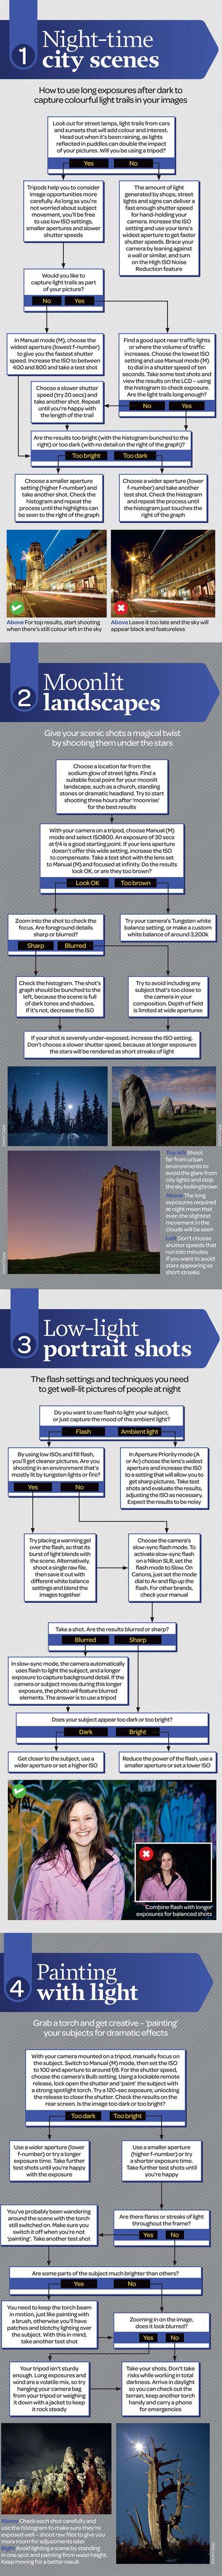 Free night photography cheat sheet: how to shoot popular low-light scenes   Digital Camera World